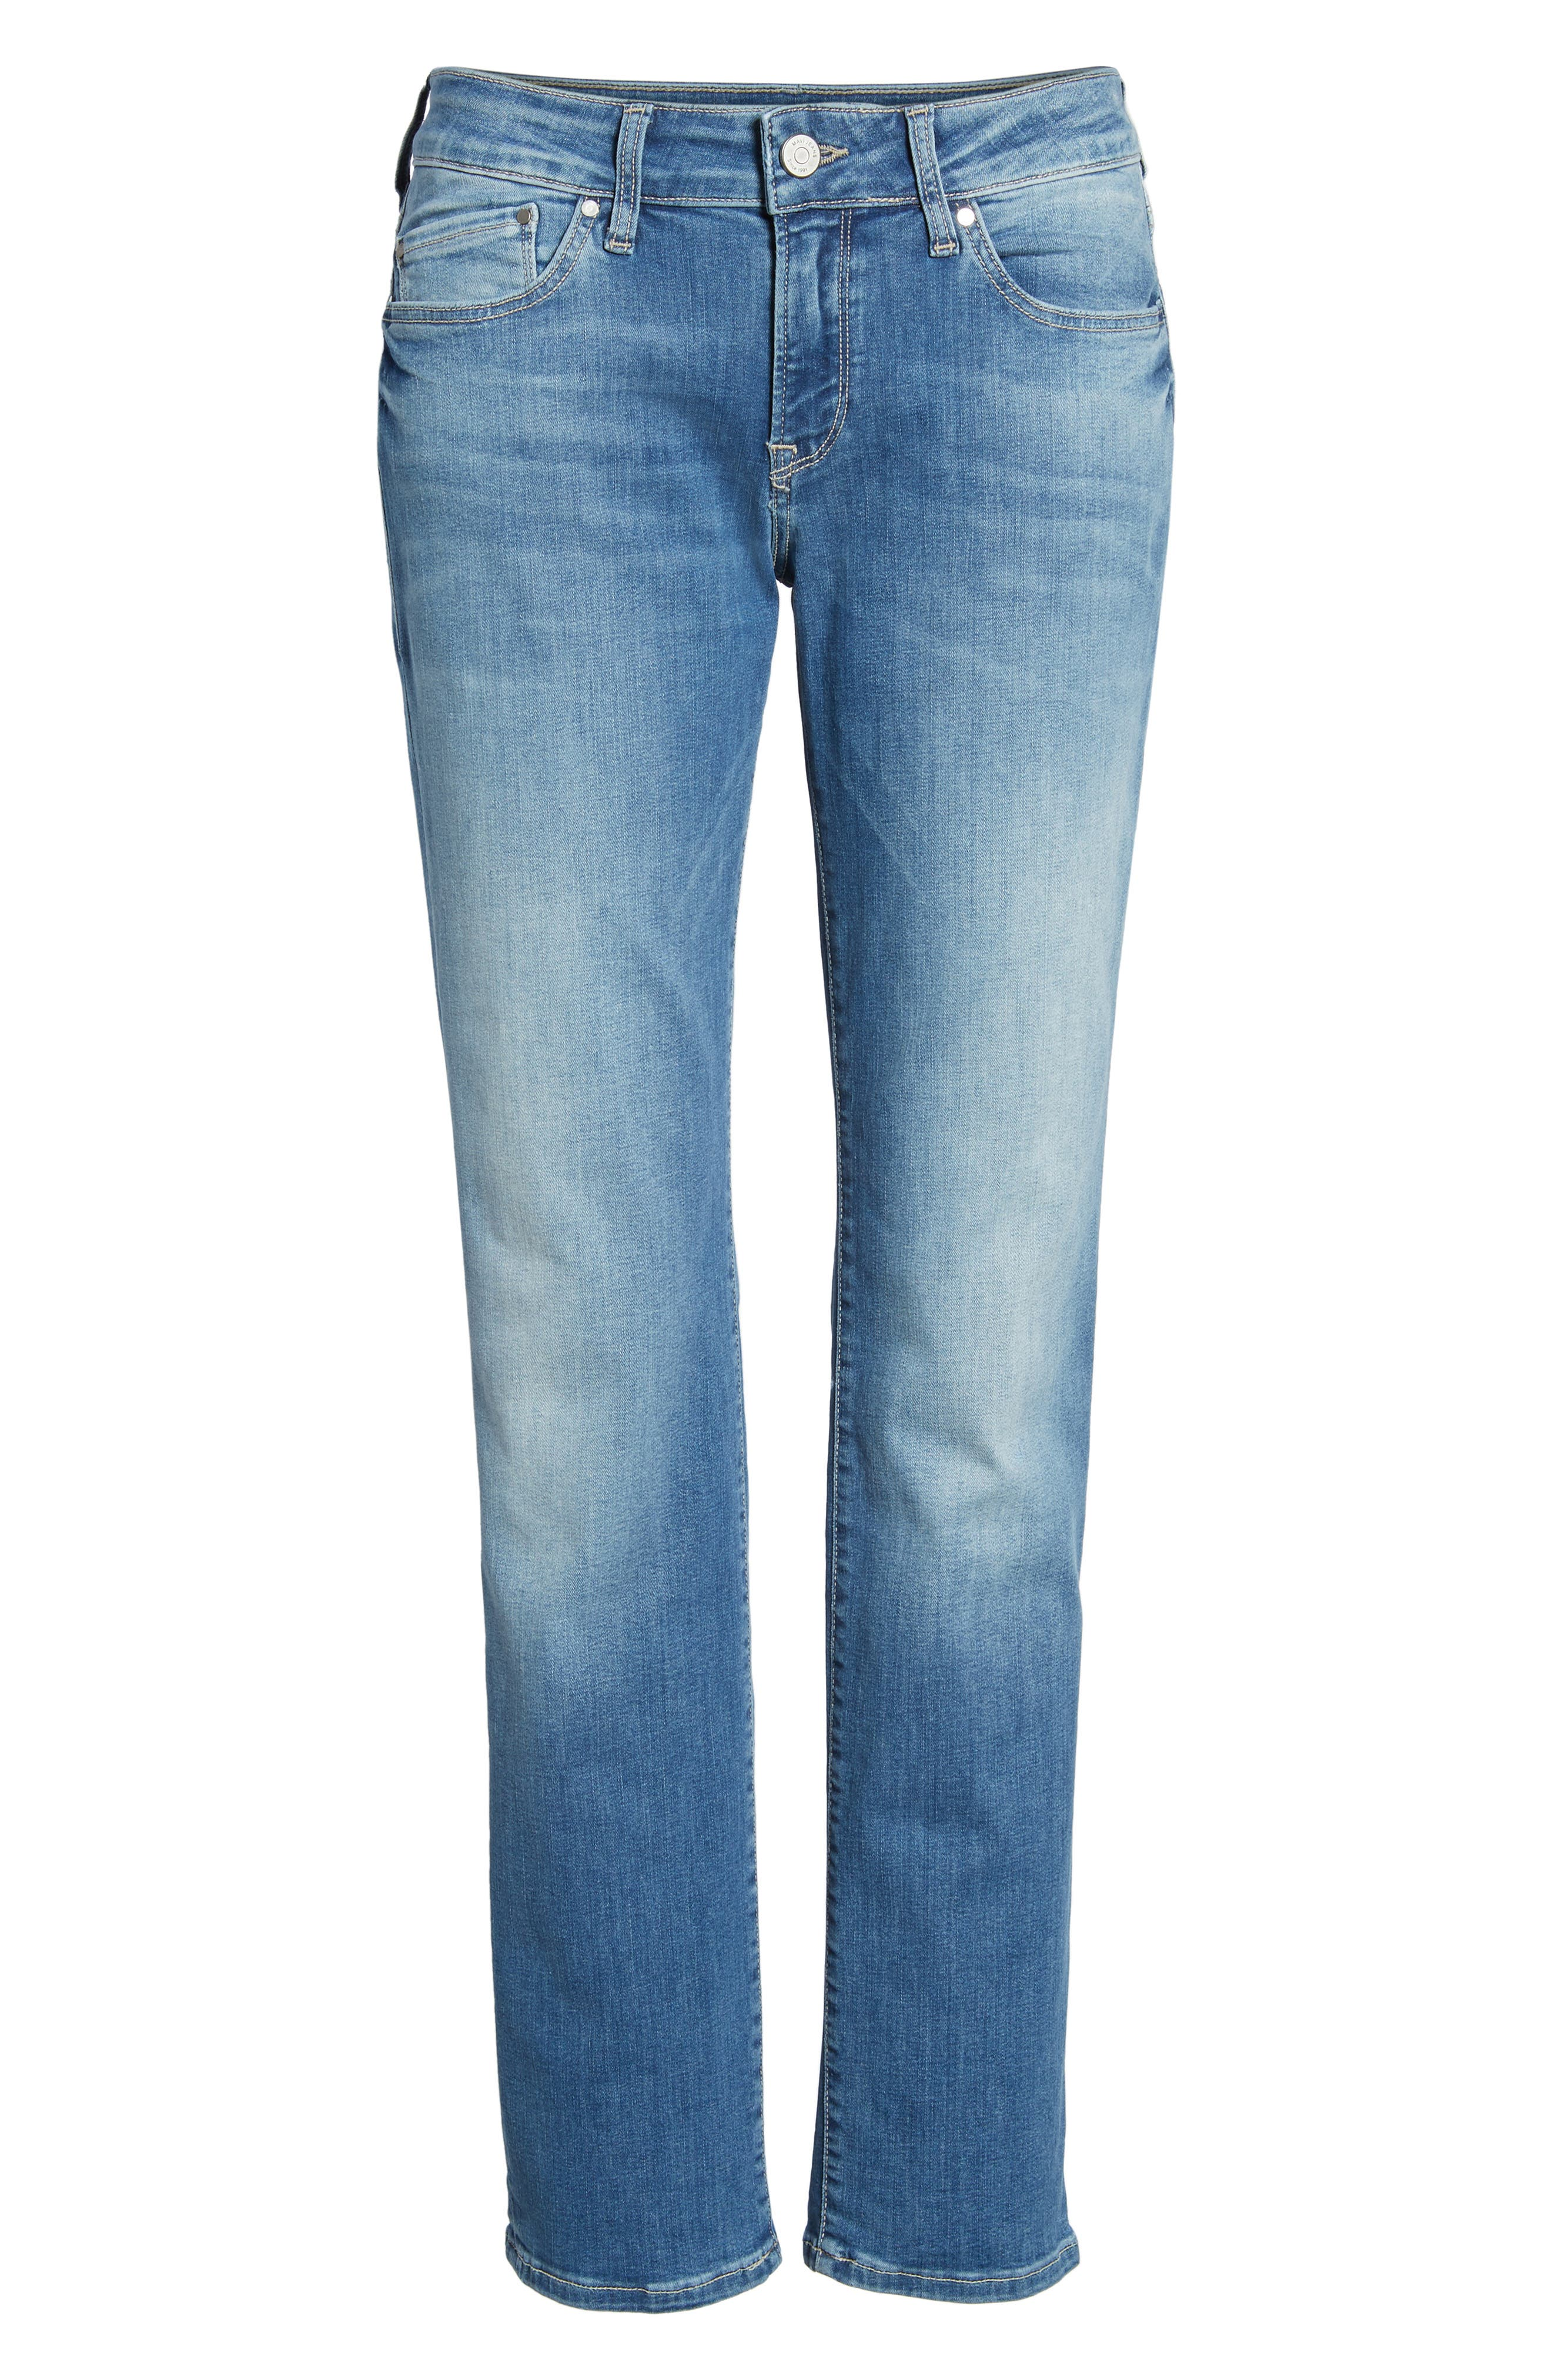 MAVI JEANS, Emma Slim Boyfriend Jeans, Alternate thumbnail 7, color, INDIGO RIPPED NOLITA